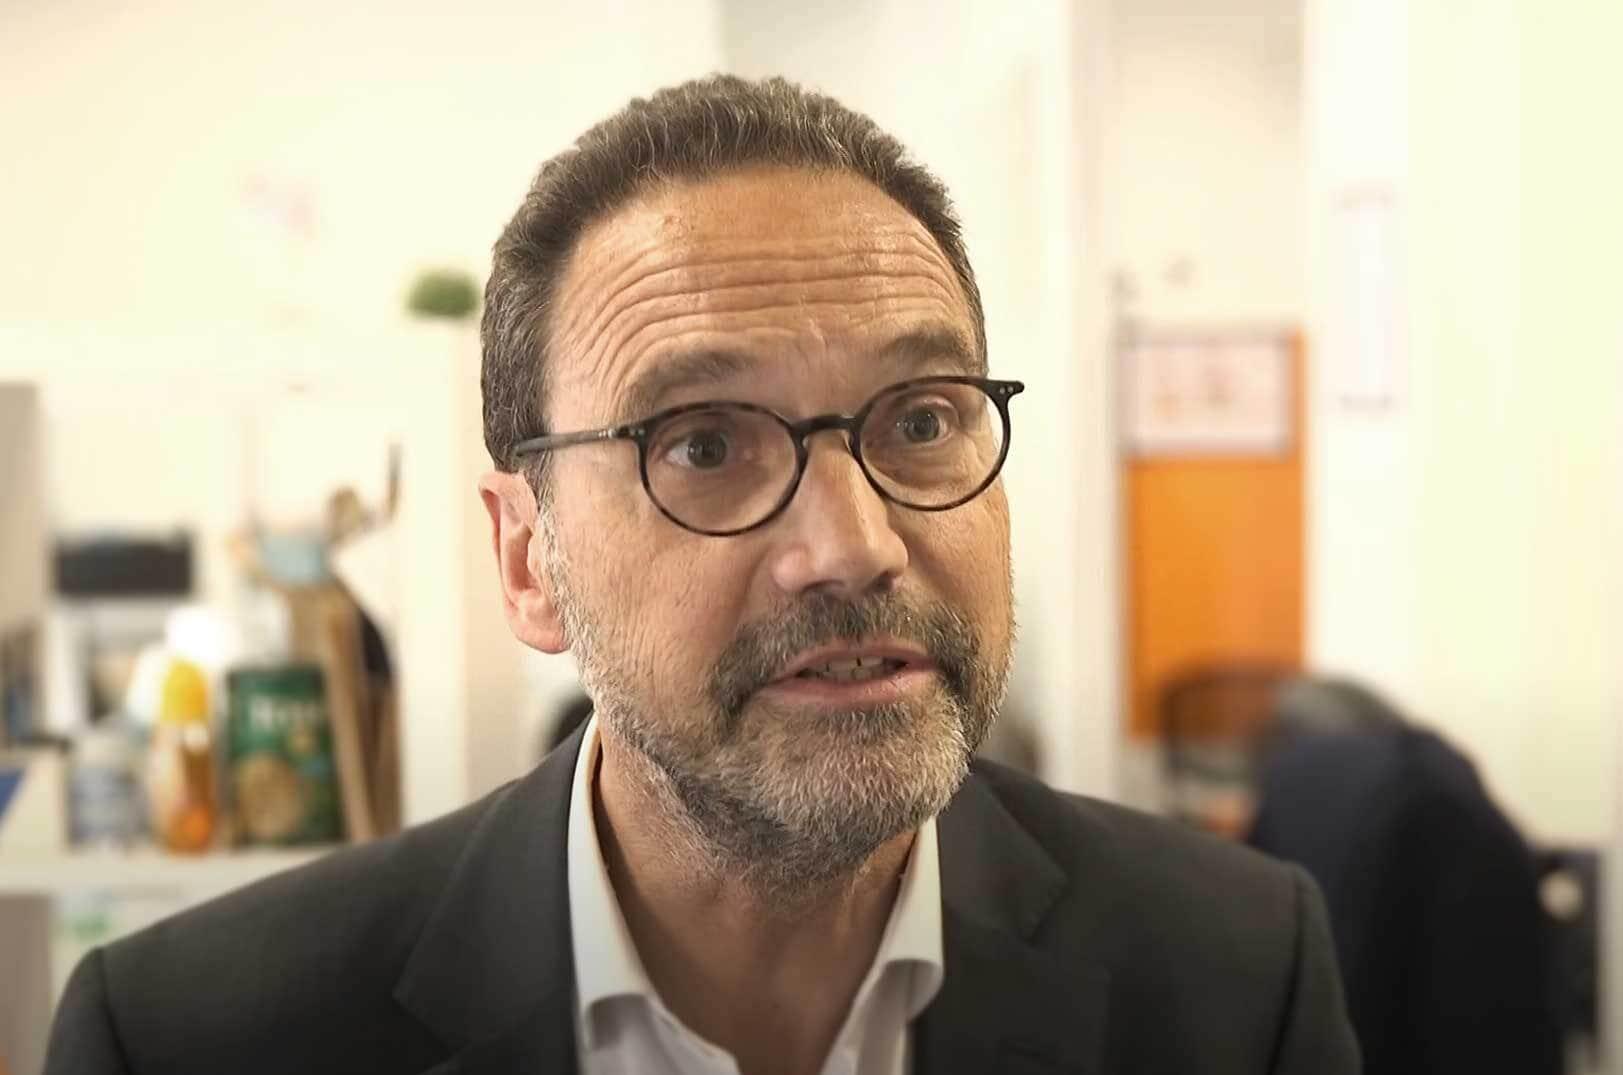 Henri-Jacques Letellier témoignage